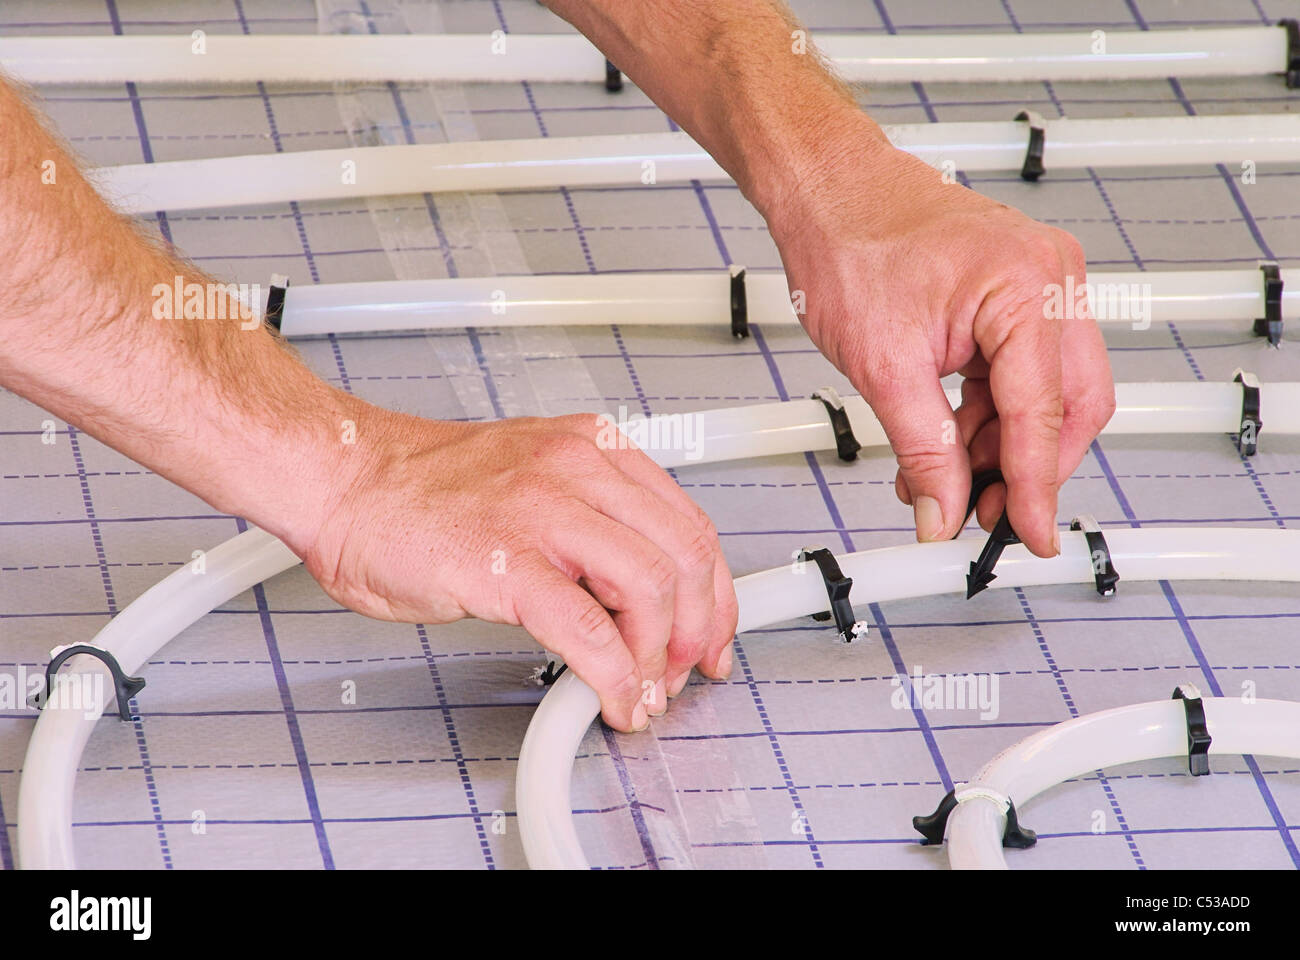 Fußbodenheizung Verlegen ~ Fussbodenheizung verlegen install under slab heating stock